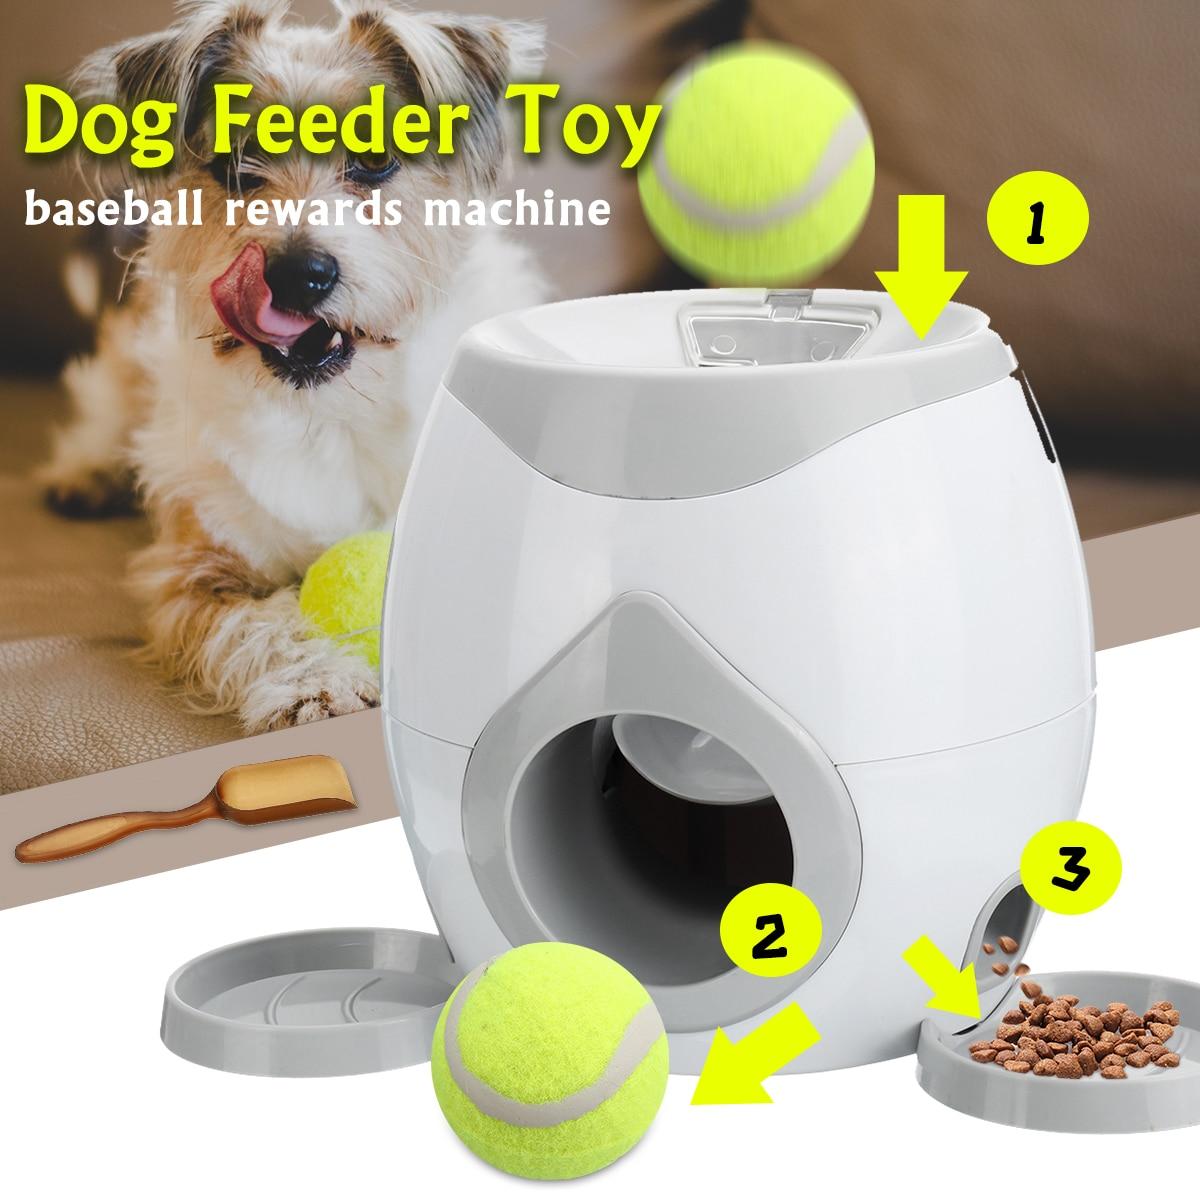 Automatic Dog Ball Feeder Award Tennis Toy Reward Interactive Machine Ball Thrower Educational Entertainment Pet Supplies+Spoon Under-cabinet lighting